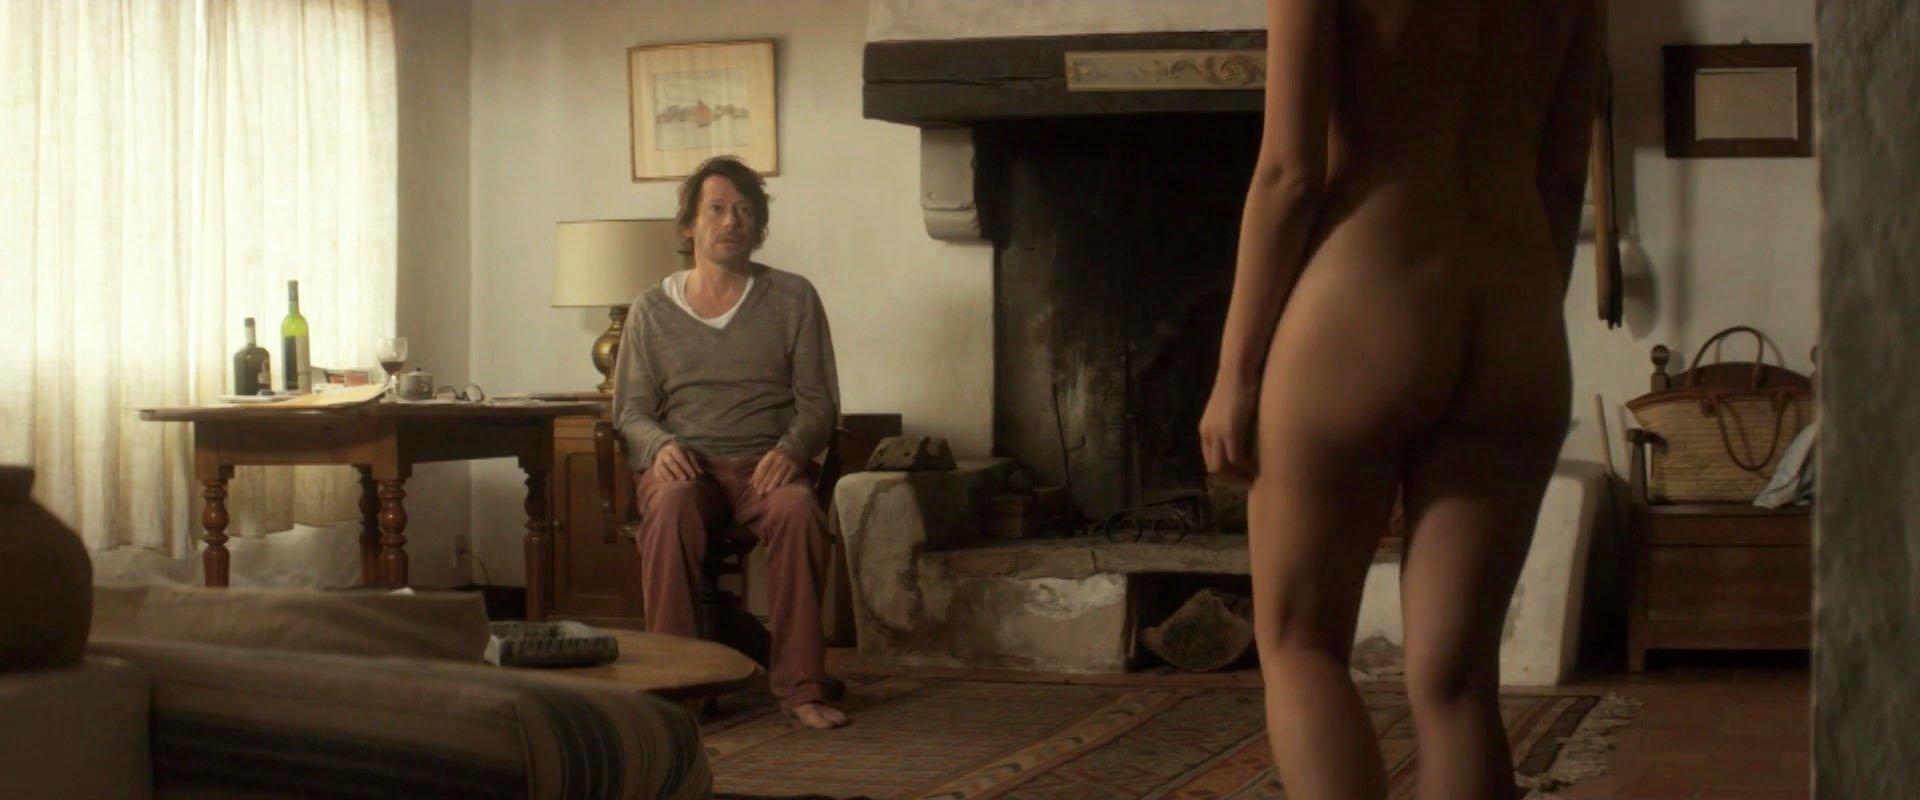 Nude Video Celebs  Marion Cotillard Nude - Les Fantomes D -8333